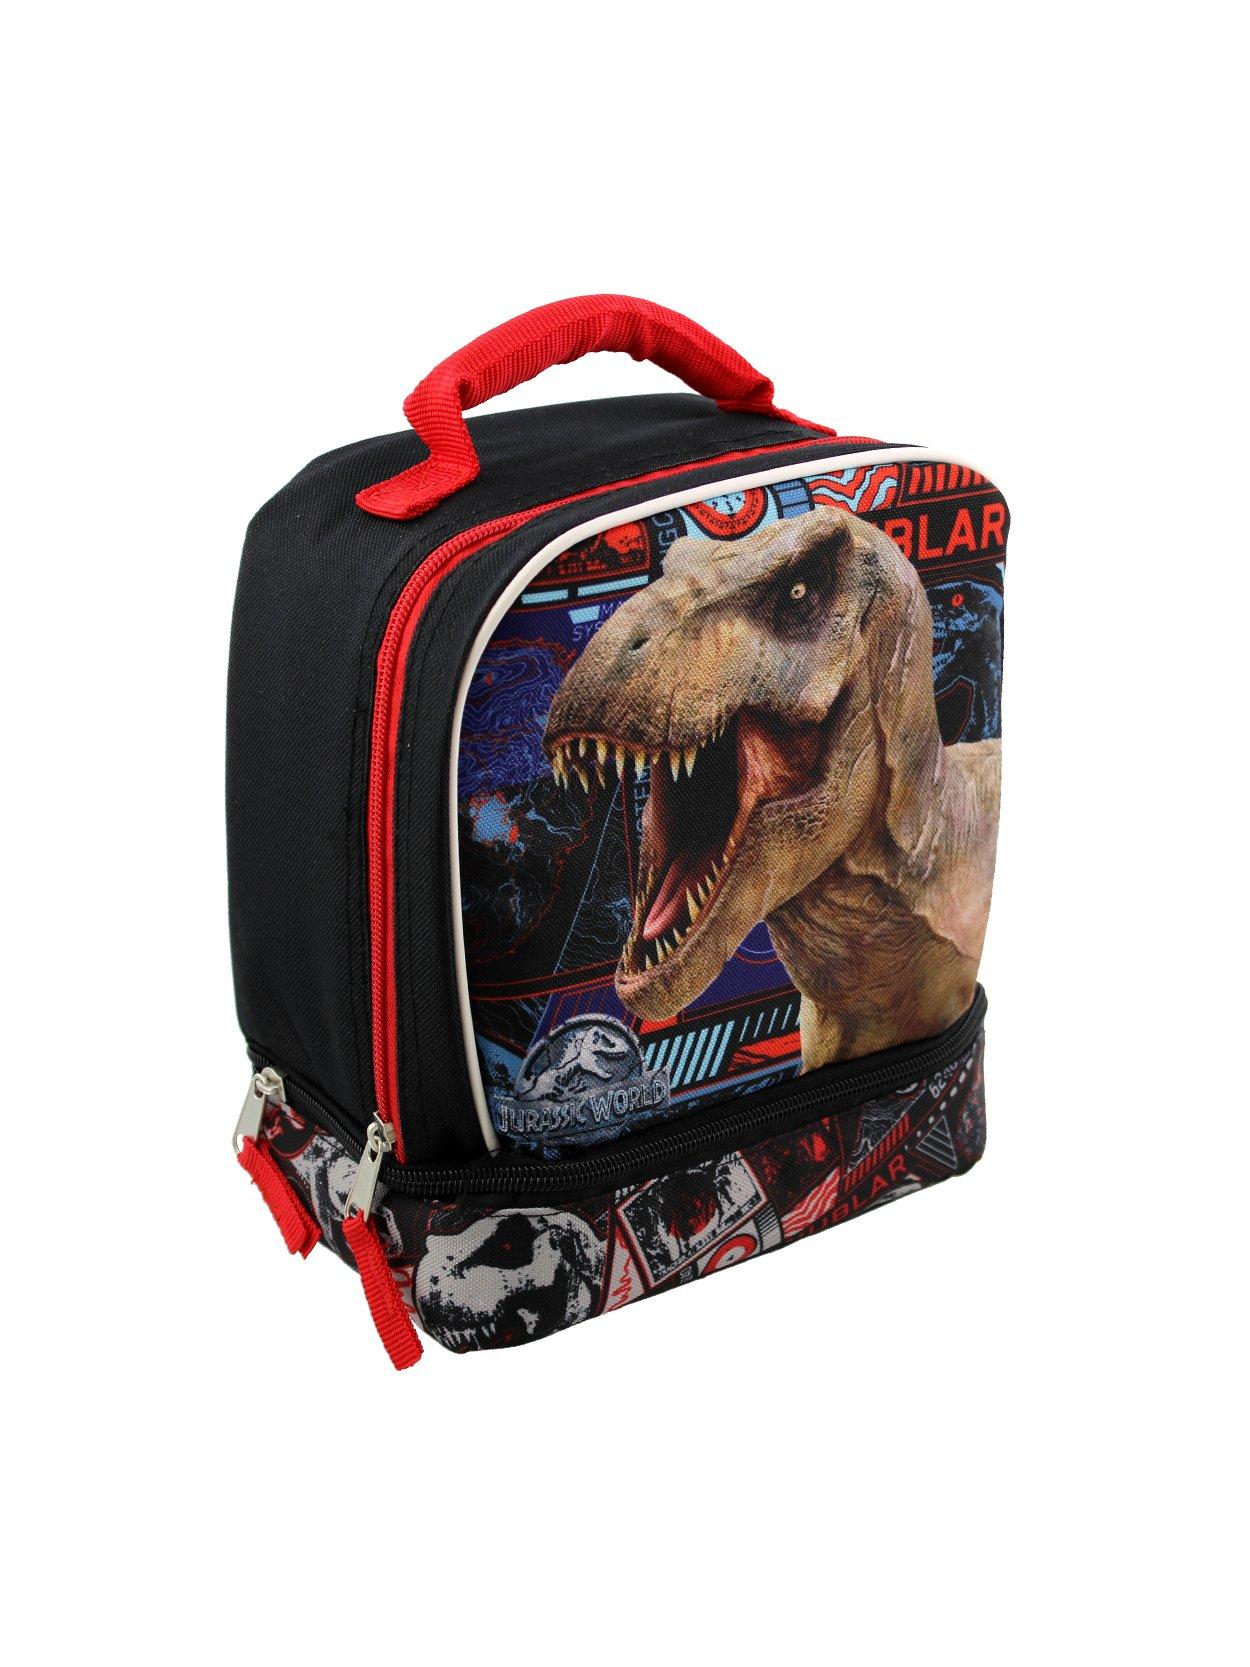 Jurassic World Compartment Lunch Black